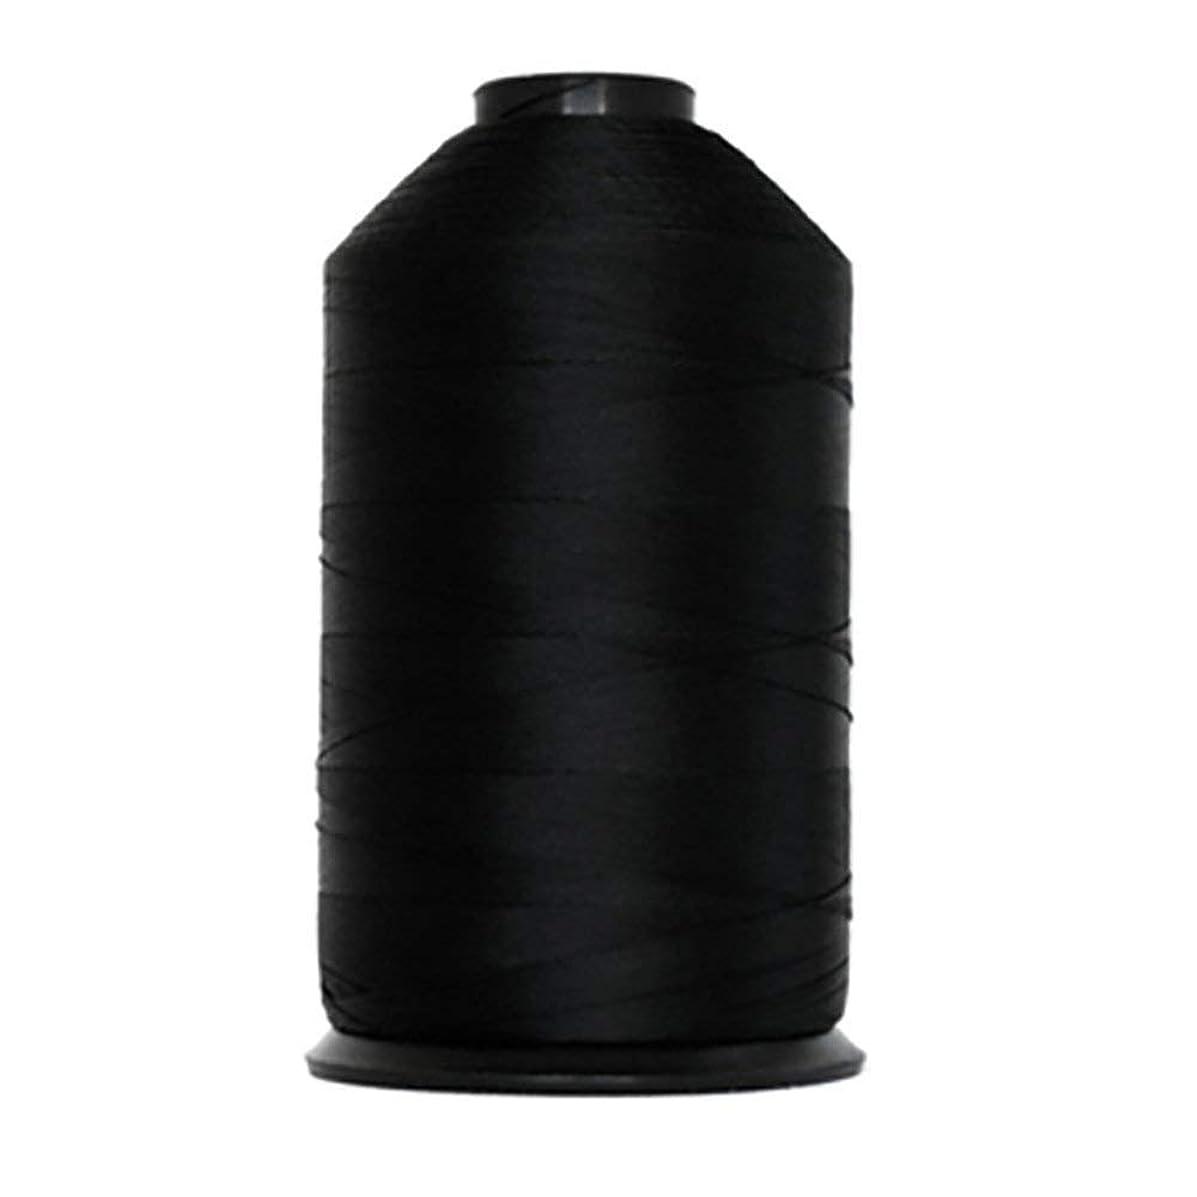 Anefil Bonded Polyester Sewing Thread #138 Tex-135 16 oz. 2,800 Yard (Black)